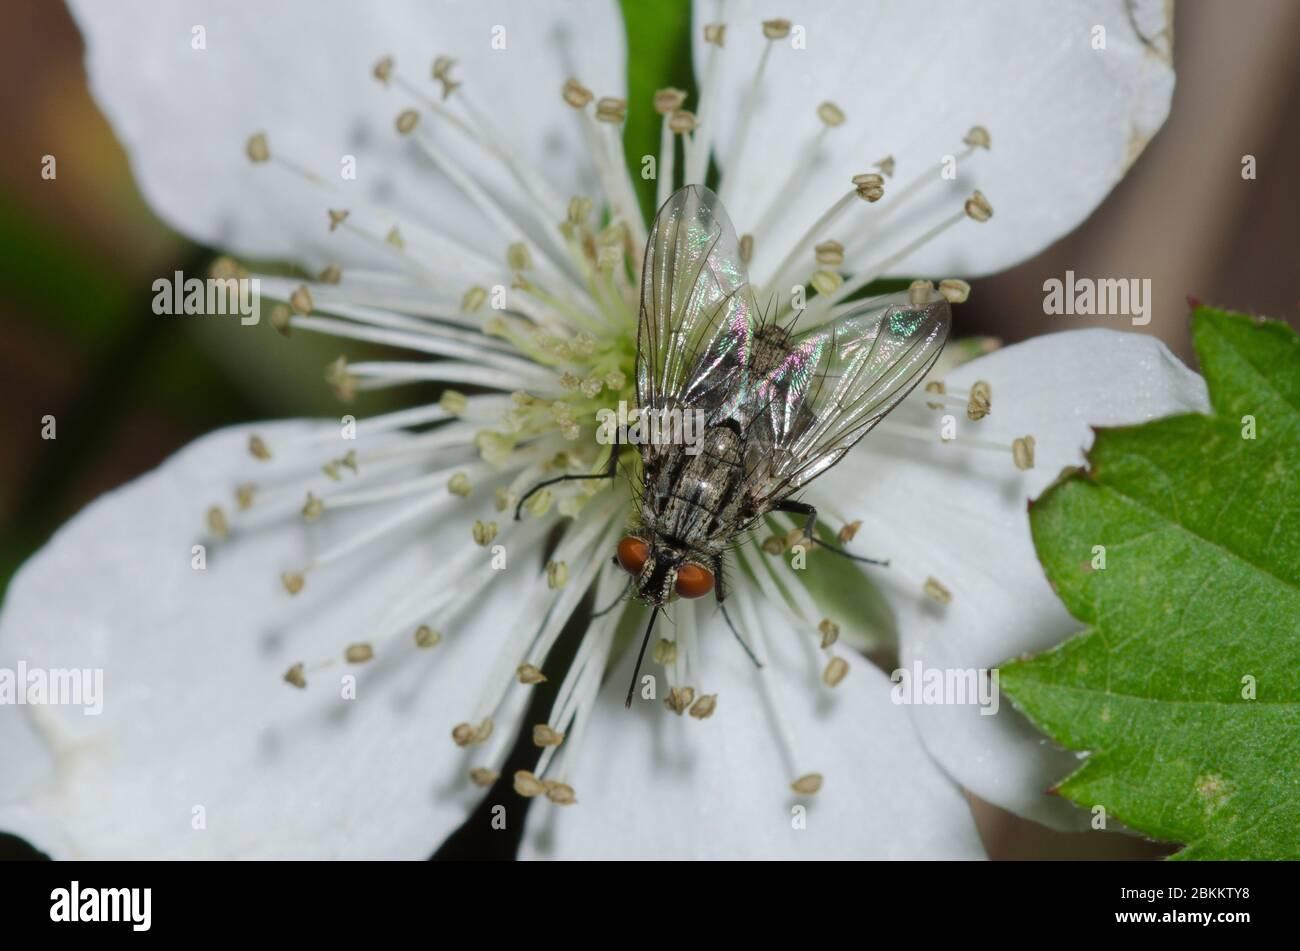 Tachinid Fly, Prosenoides sp., foraging on blackberry, Rubus sp., blossom Stock Photo